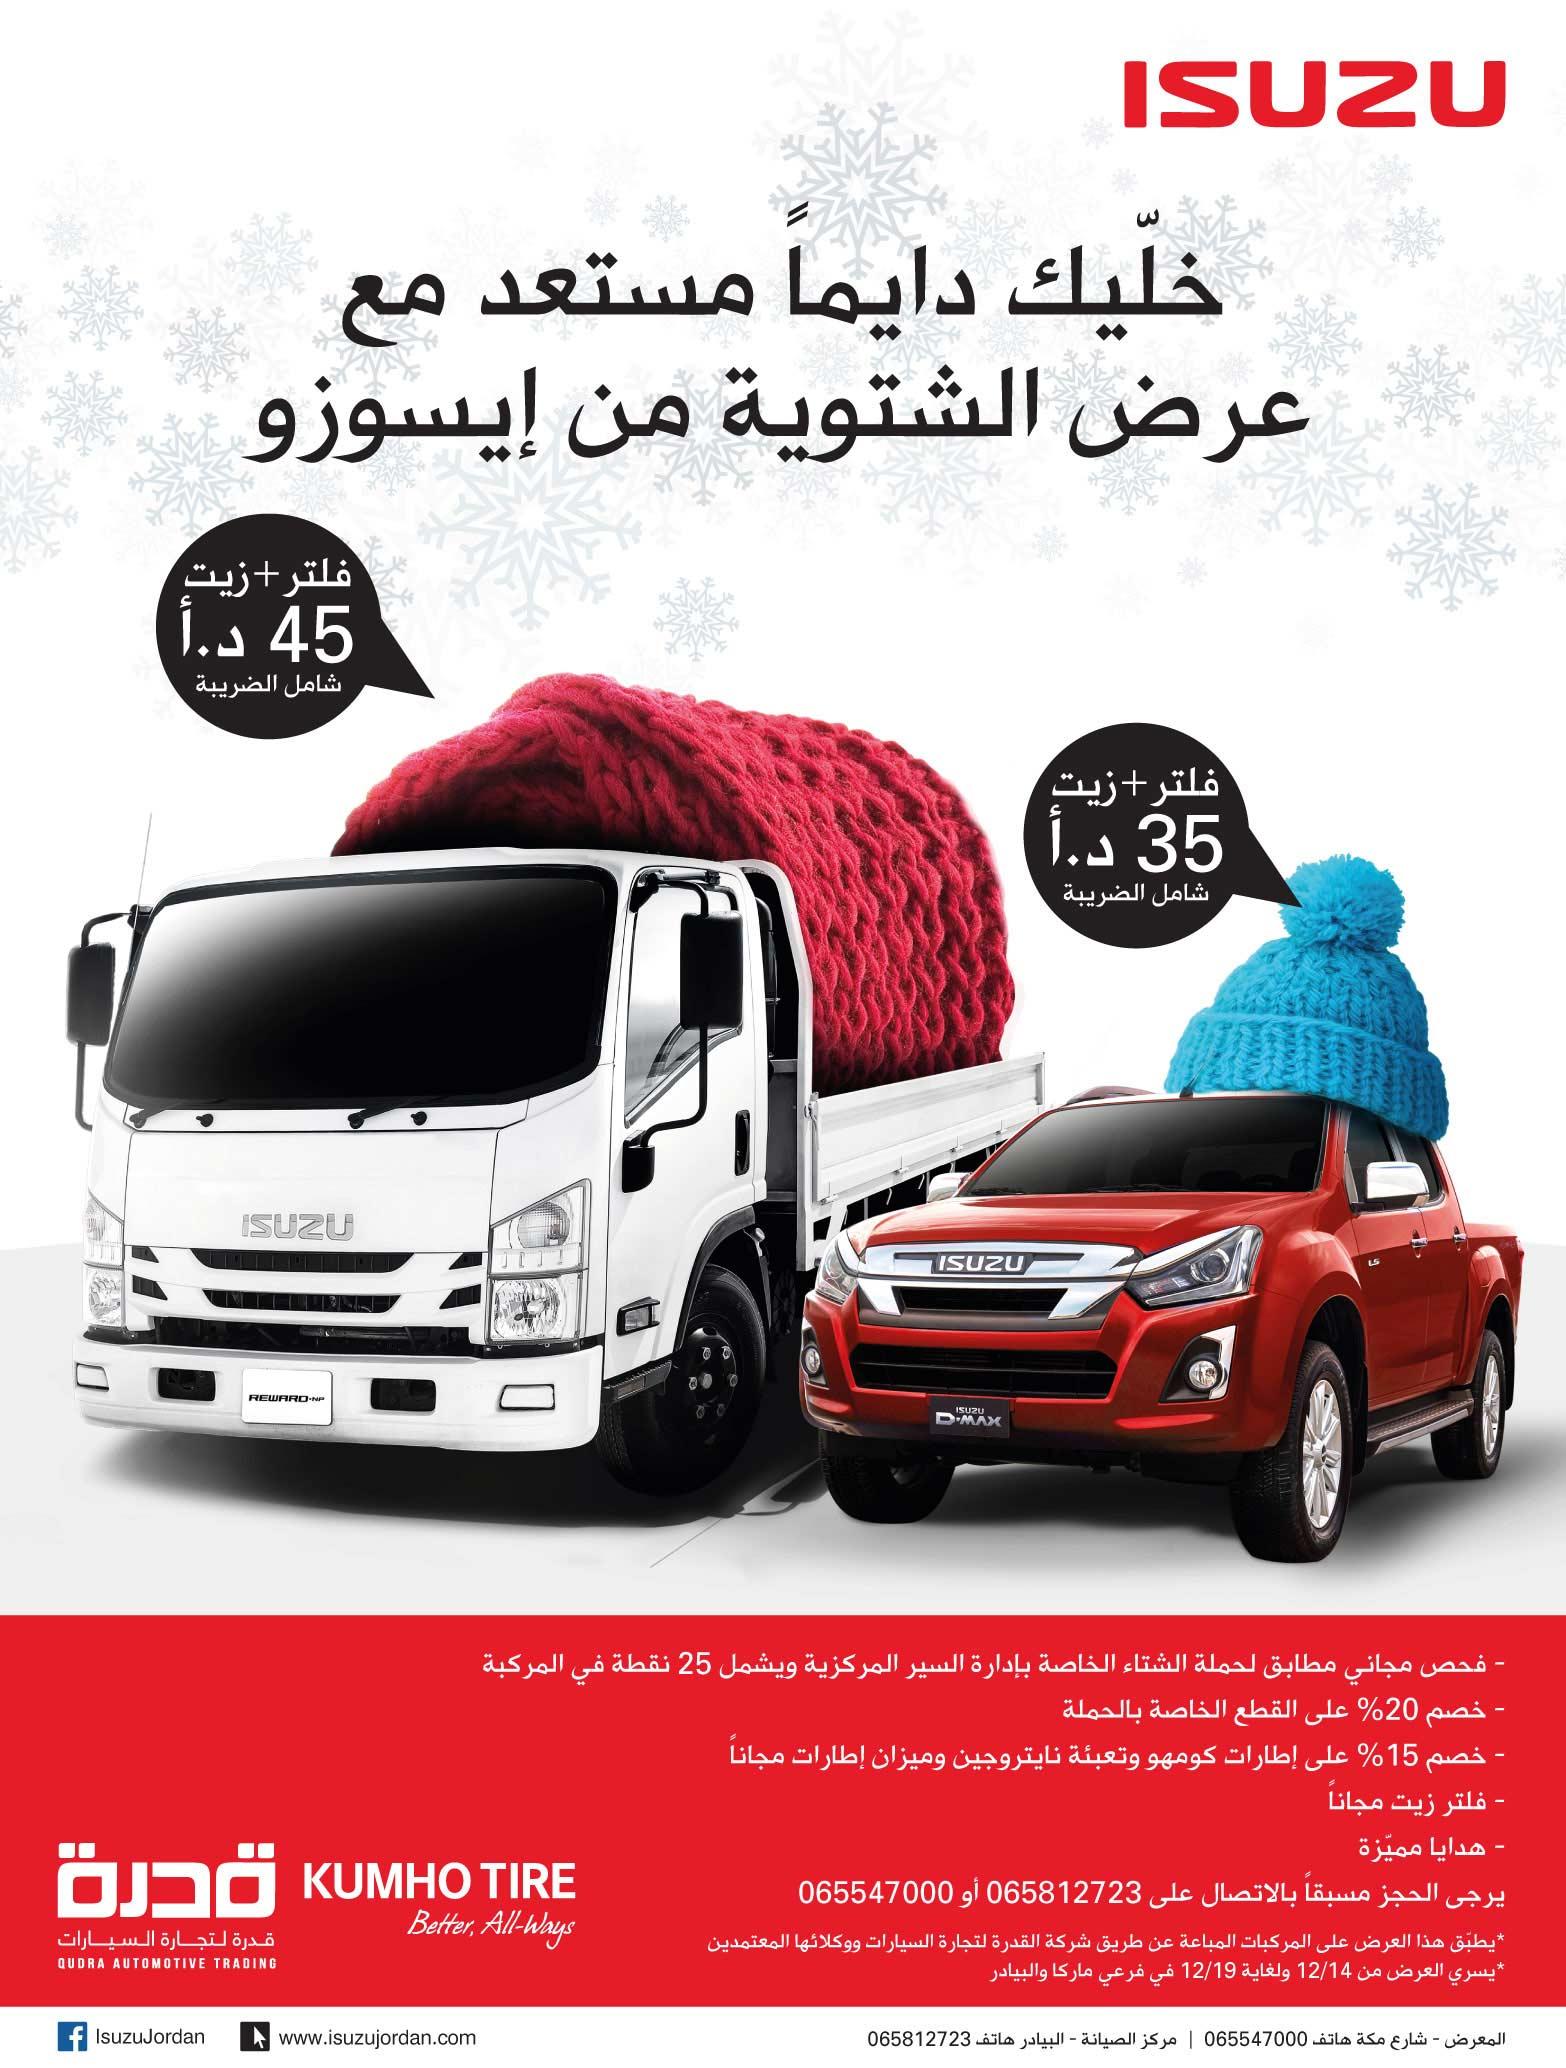 Isuzu Qudra Automotive Service Clinic Winter Campaign Banner